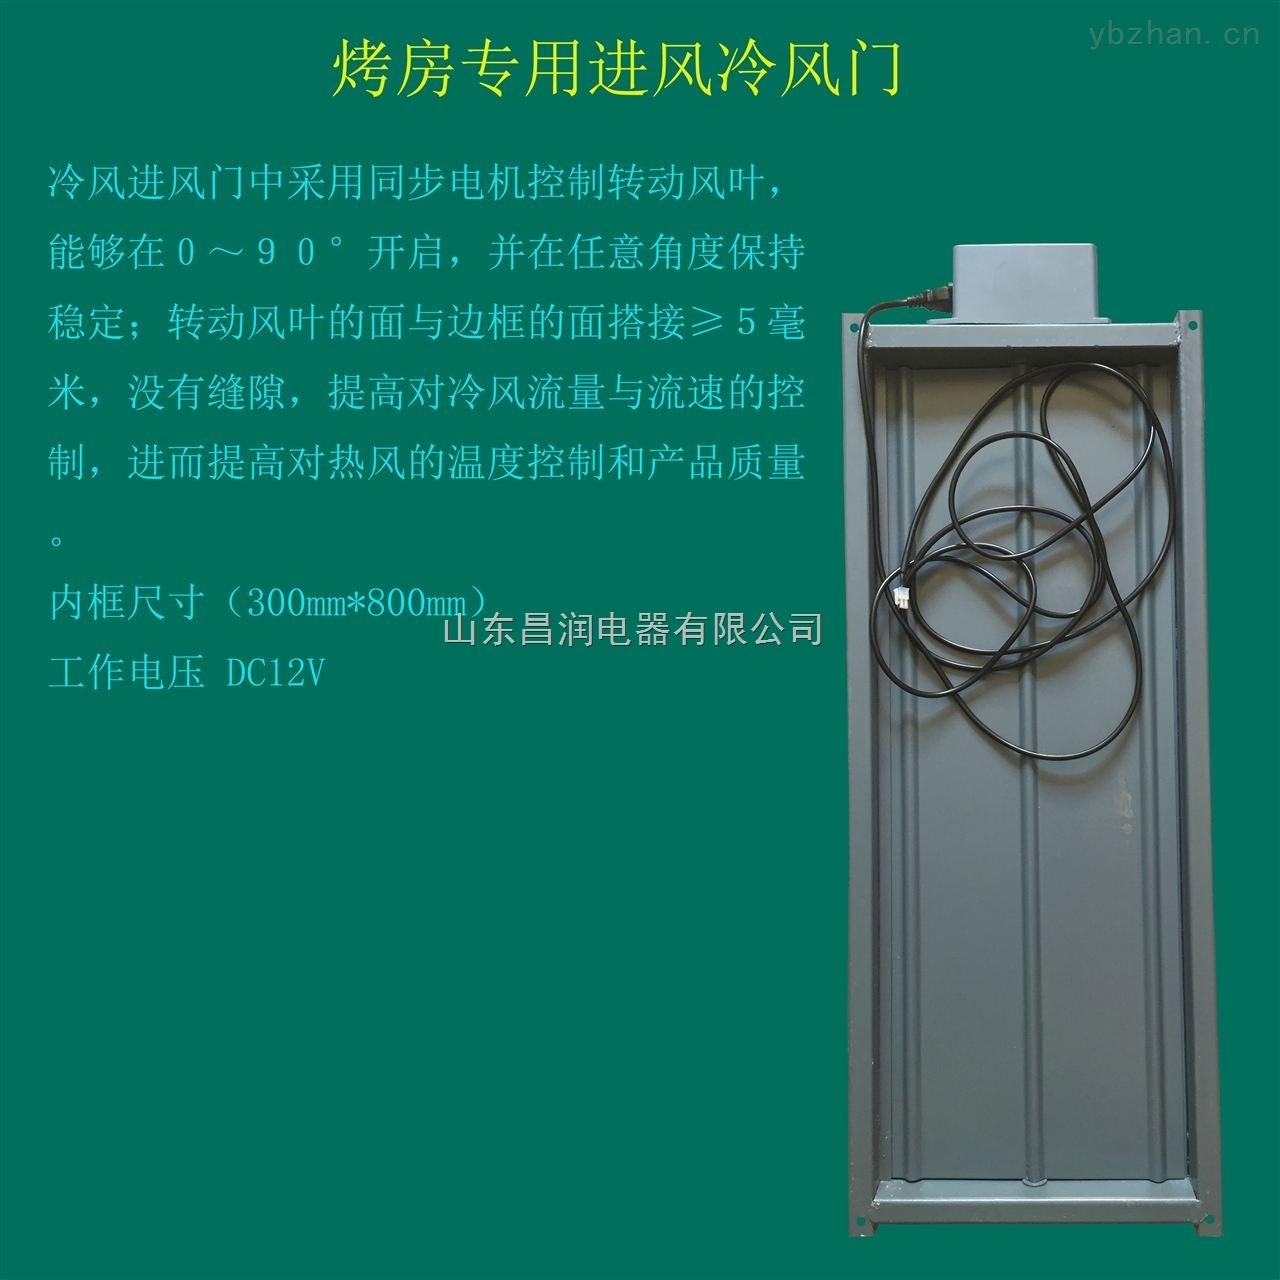 fm 烤房专用进风门_温度仪表_控制显示仪_温度控制器